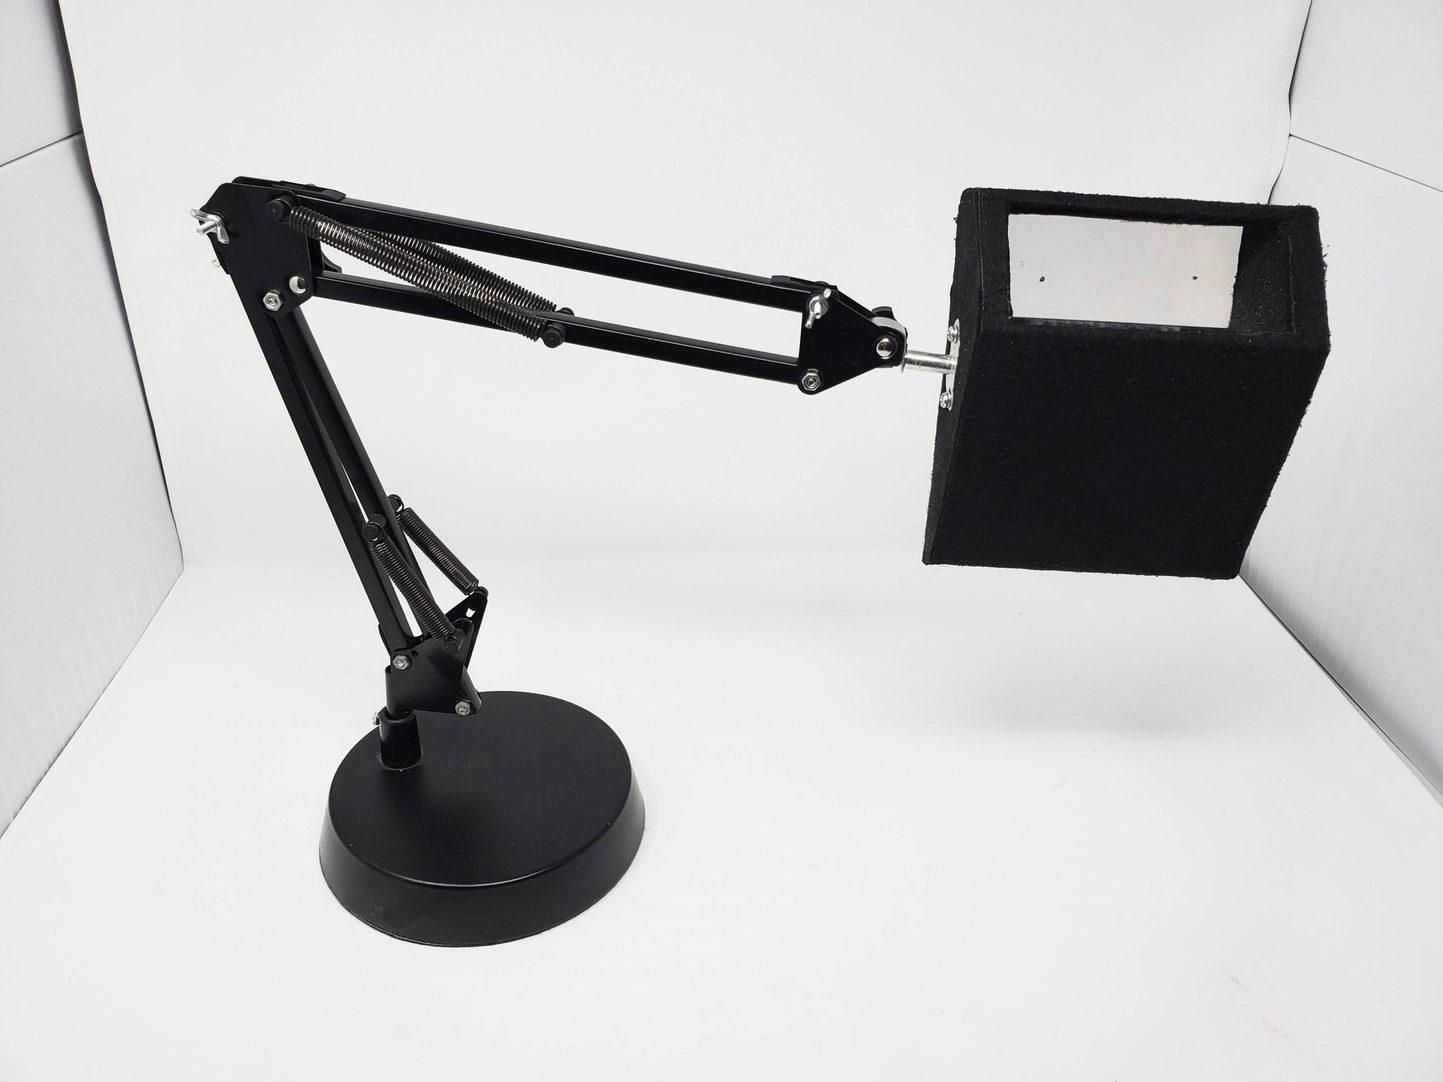 Camera lucida stand